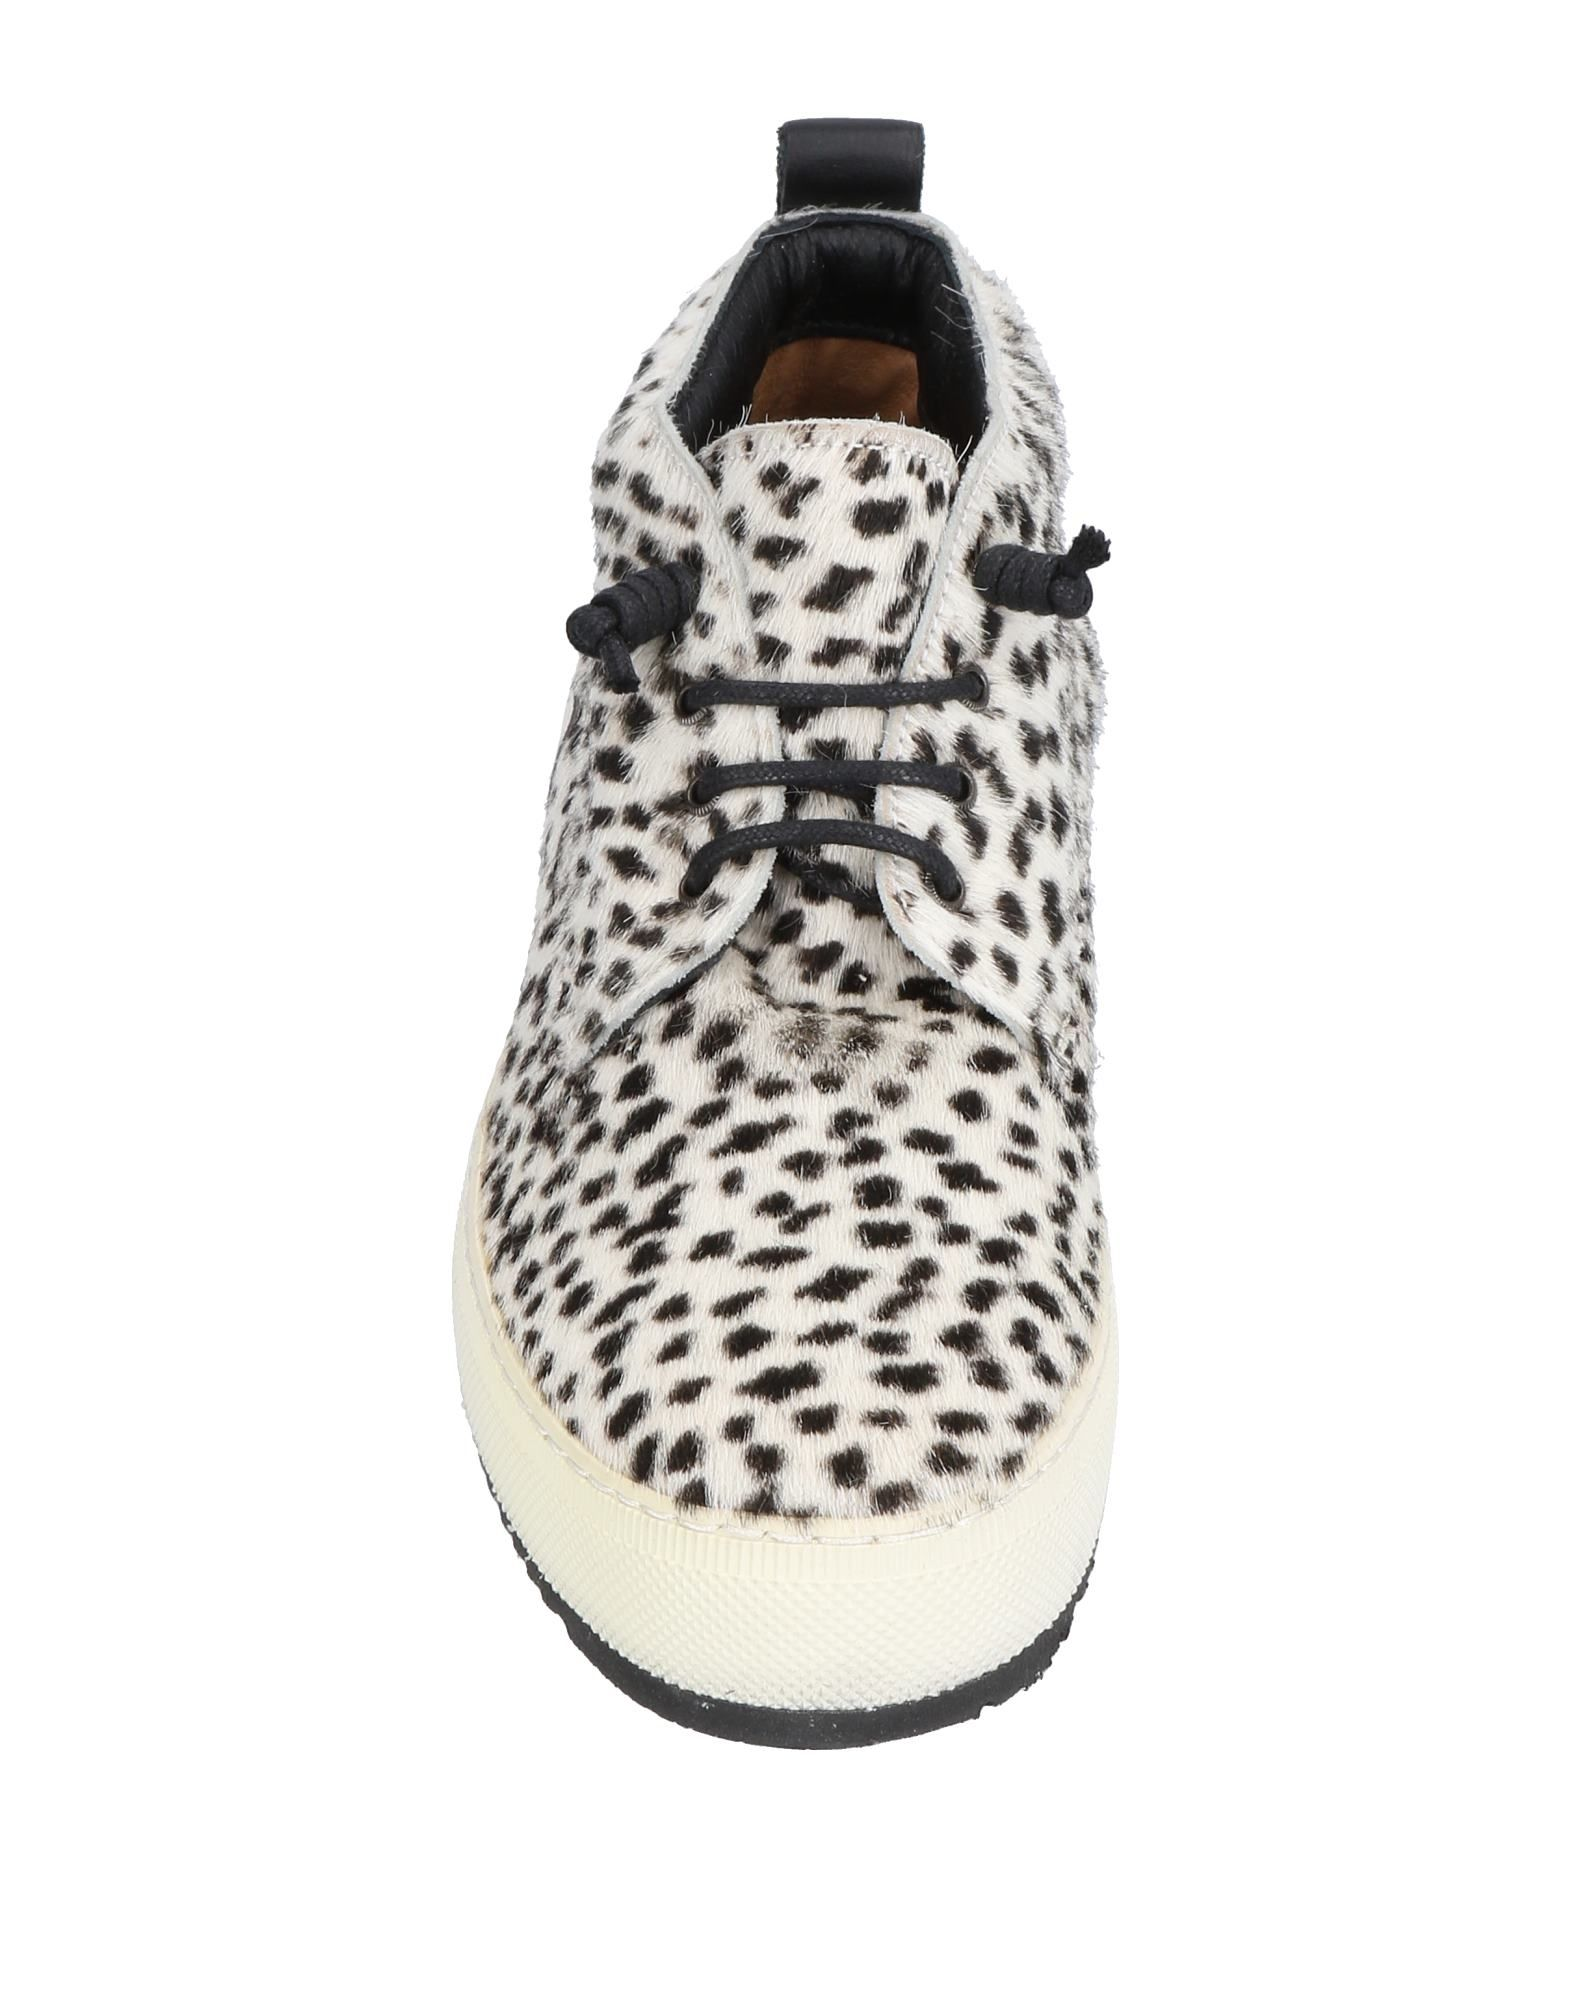 Barleycorn Sneakers Gute Damen  11475569VQ Gute Sneakers Qualität beliebte Schuhe e73c49